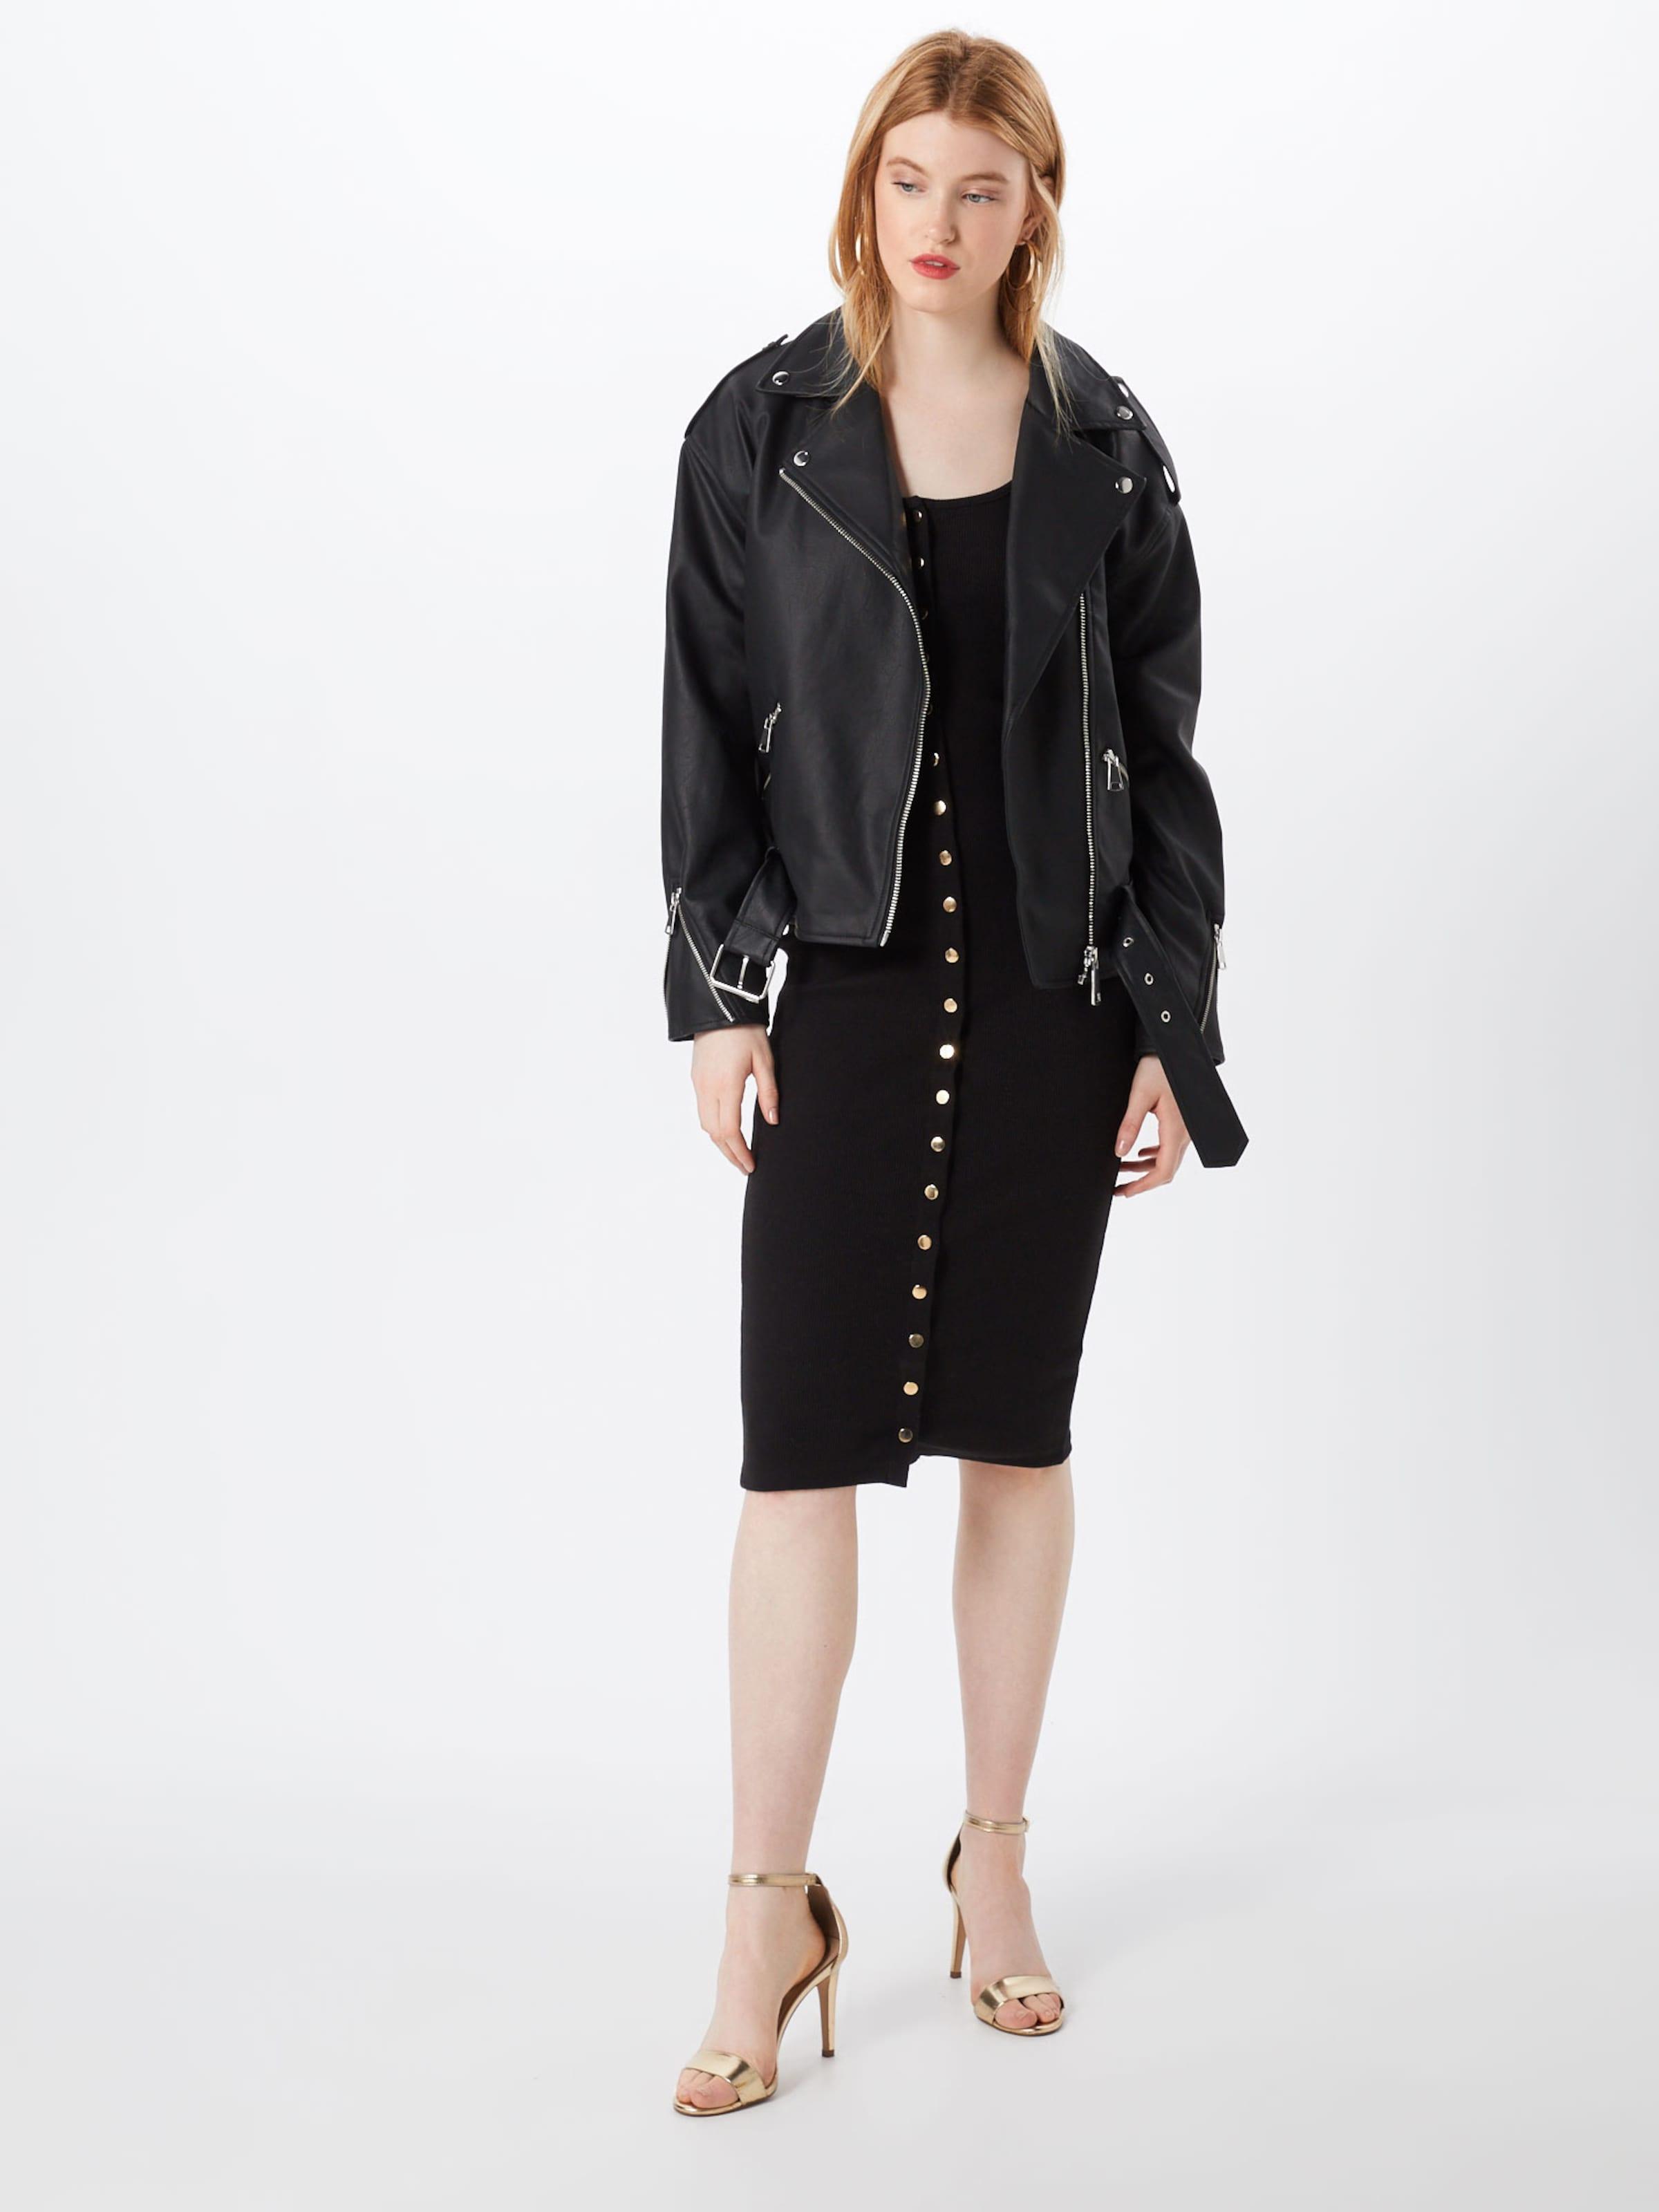 En Missguided Robe En Robe Noir Missguided Noir Robe Missguided En hrCtdQs